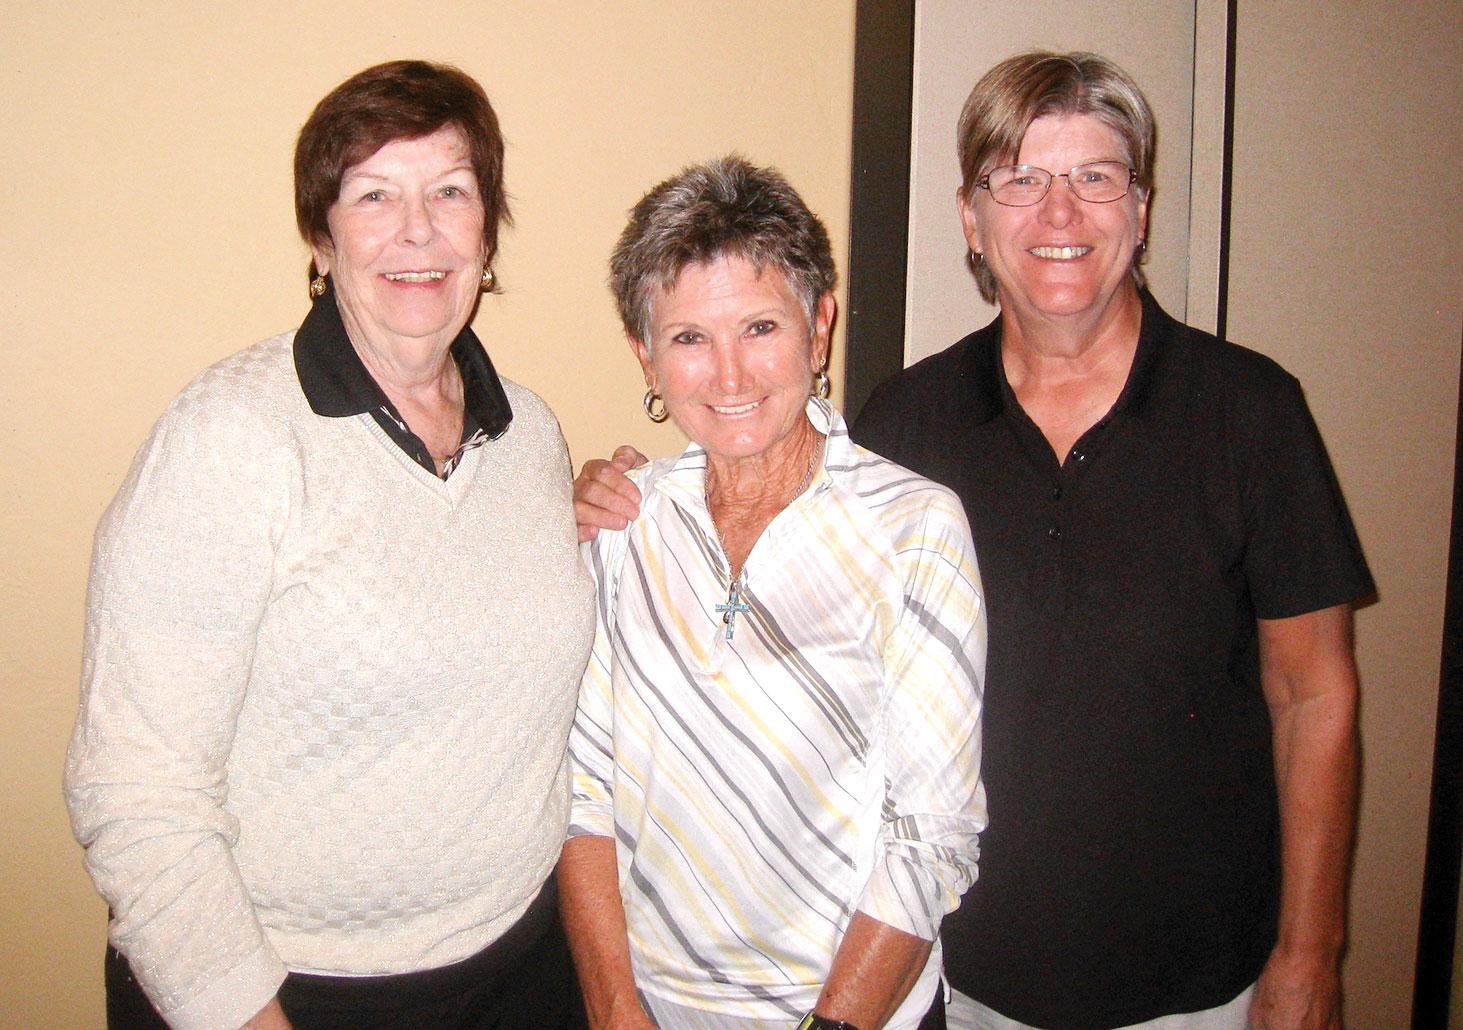 Quail Creek flight three winners Gail Philips, Chris England and Bonnie Anderson